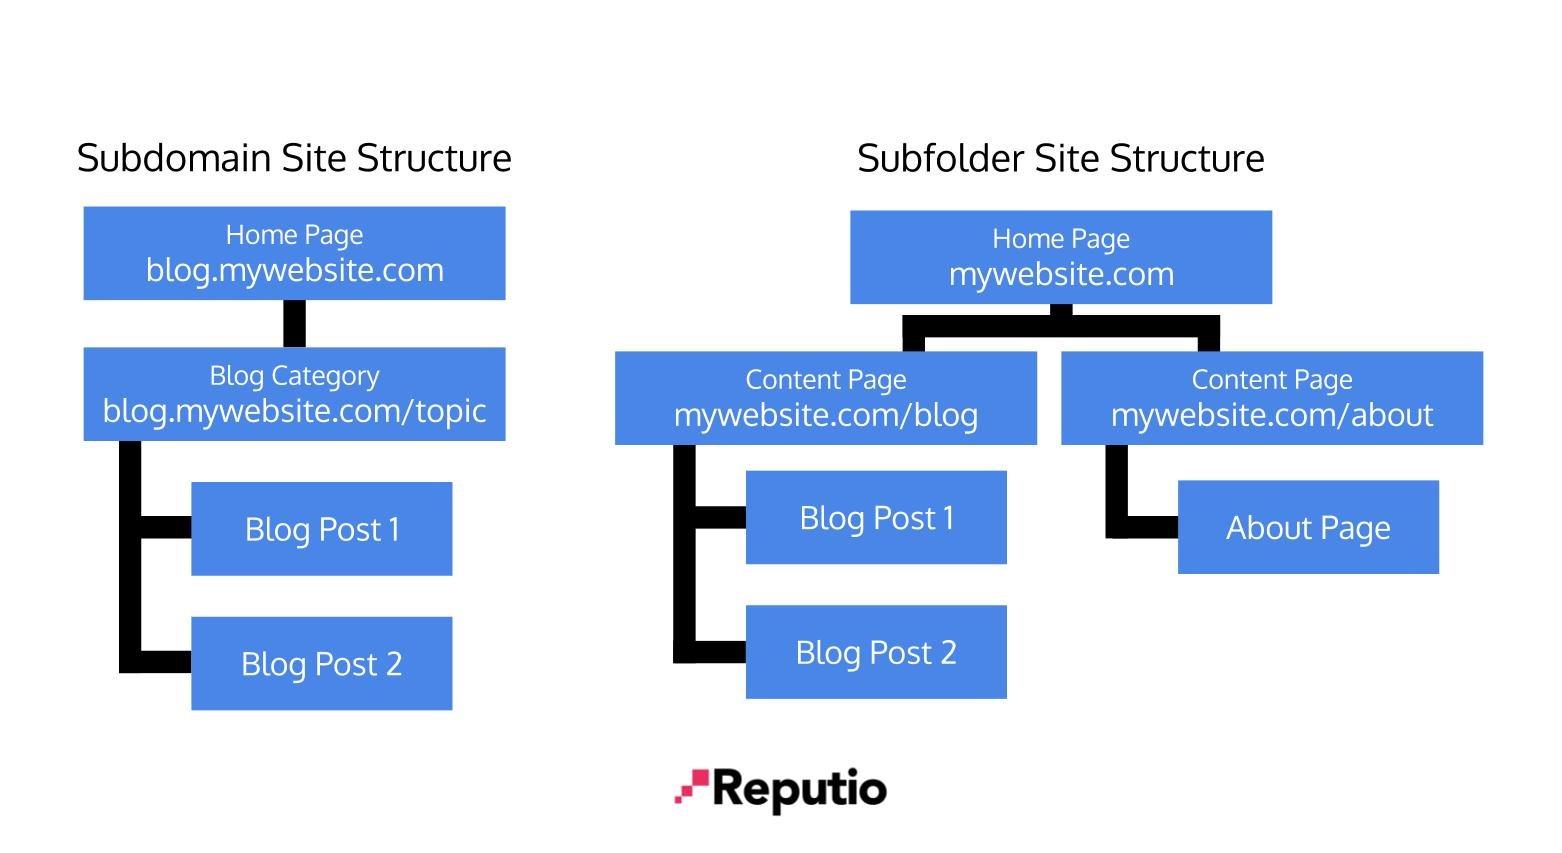 Subfolder & Subdomain Site Structures